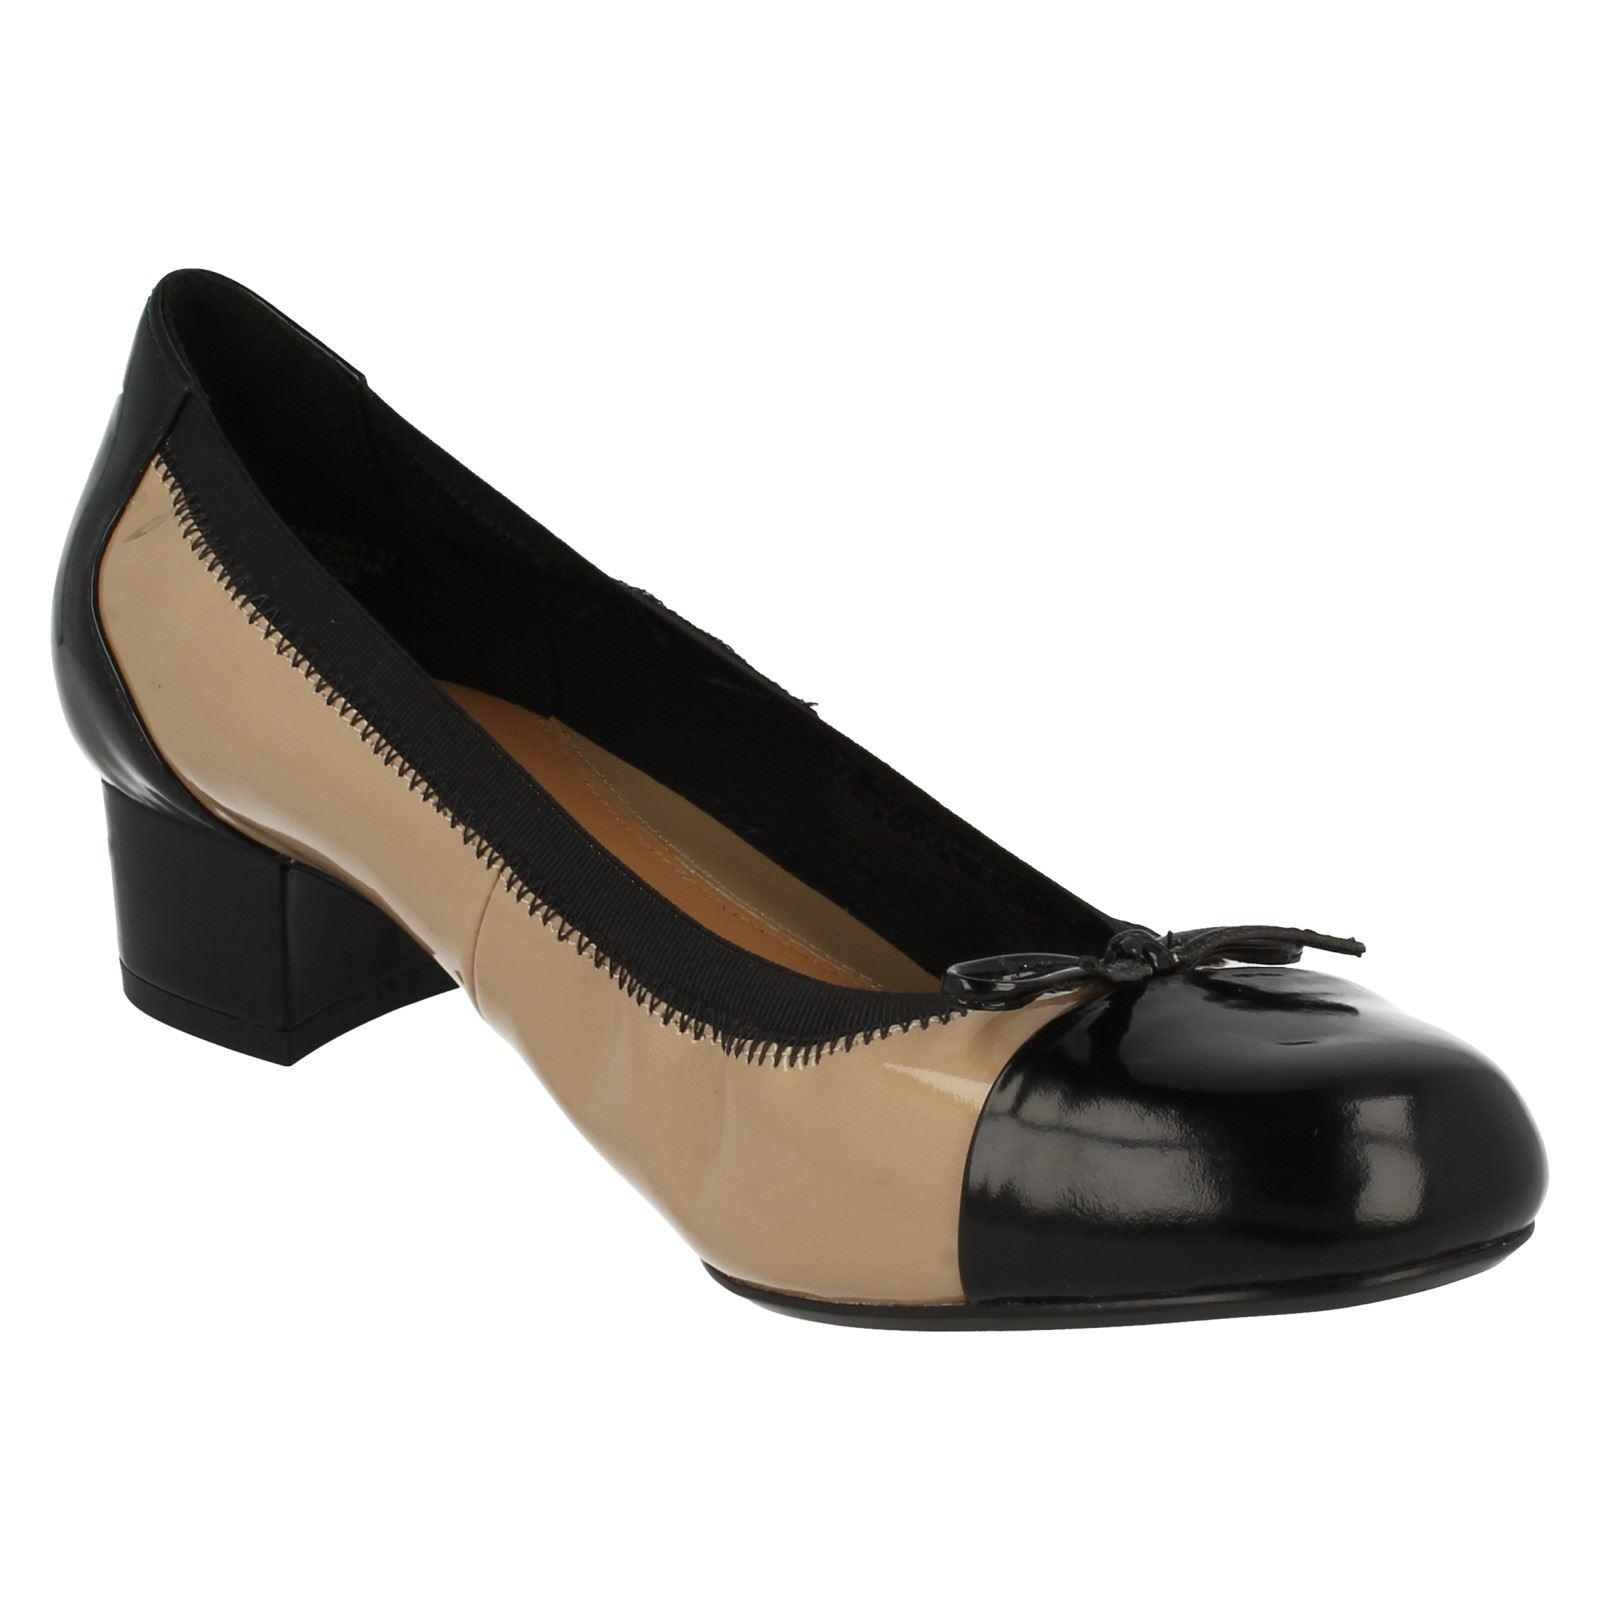 0501995647226 Ladies Clarks Low Heeled Fashion Shoes 'Balcony Poem' | eBay